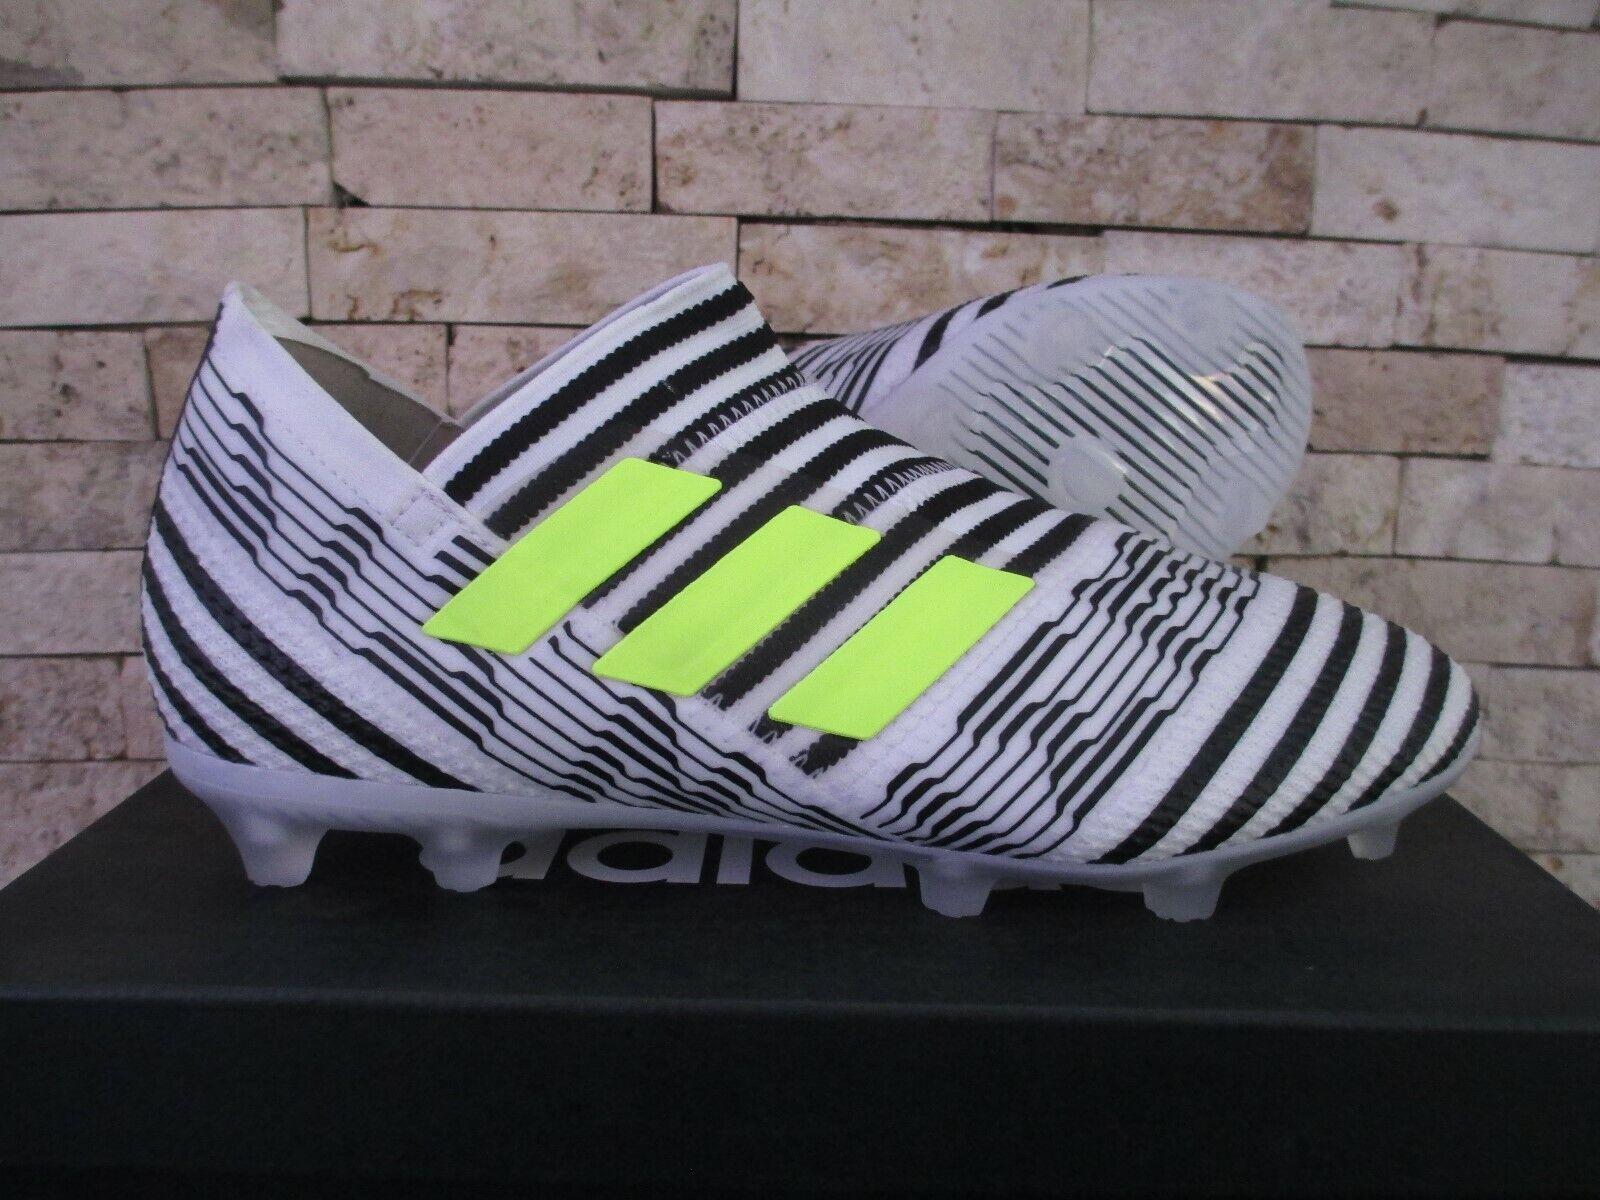 Adidas NEMEZIZ MESSI 17+ FG 360 Agility Fußballschuhe Kinder 200 € Größe 38